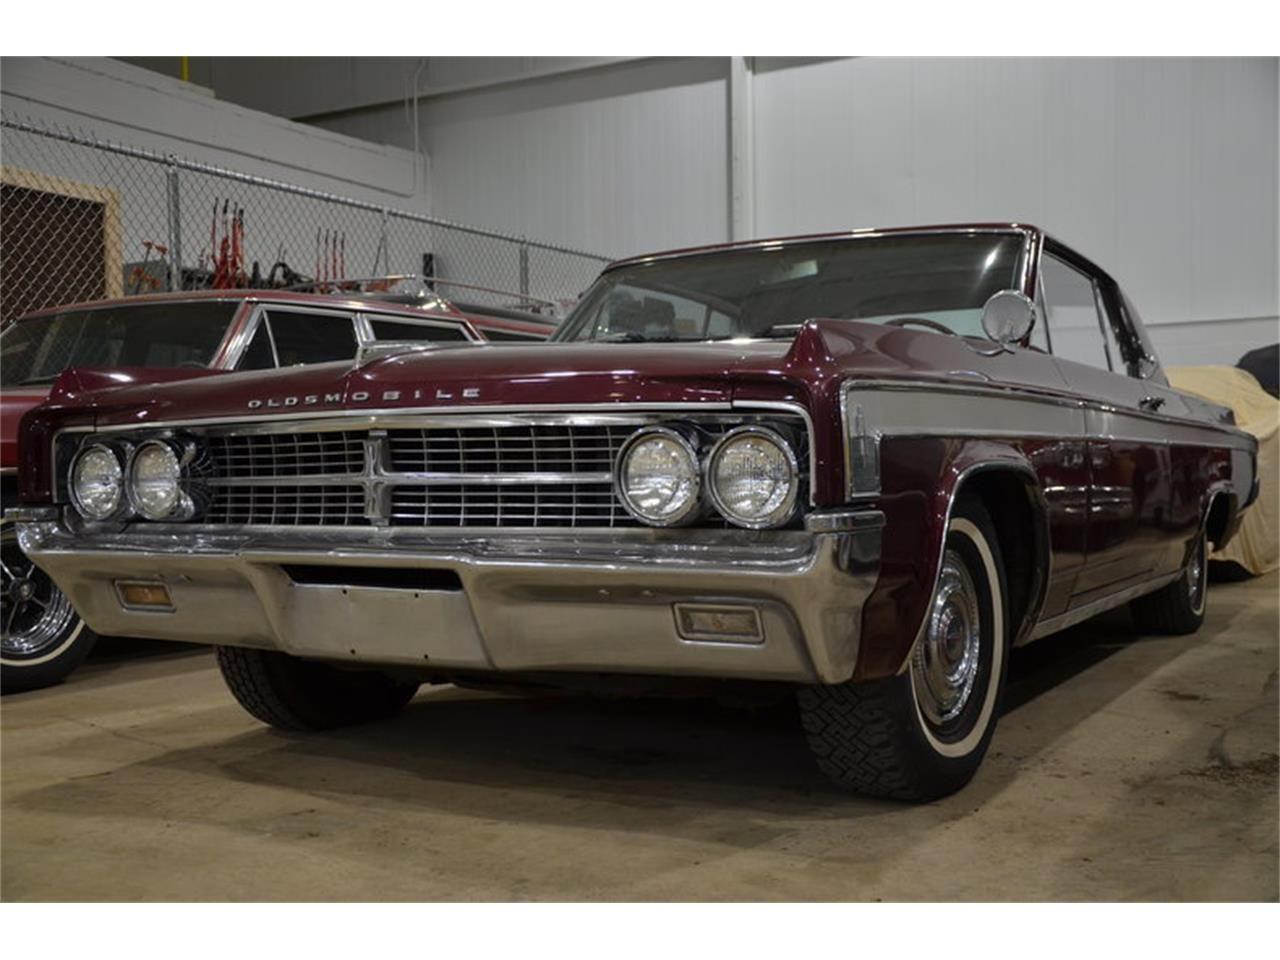 1963 Oldsmobile Starfire | Oldsmobiles and Pontiacs | Pinterest | Cars